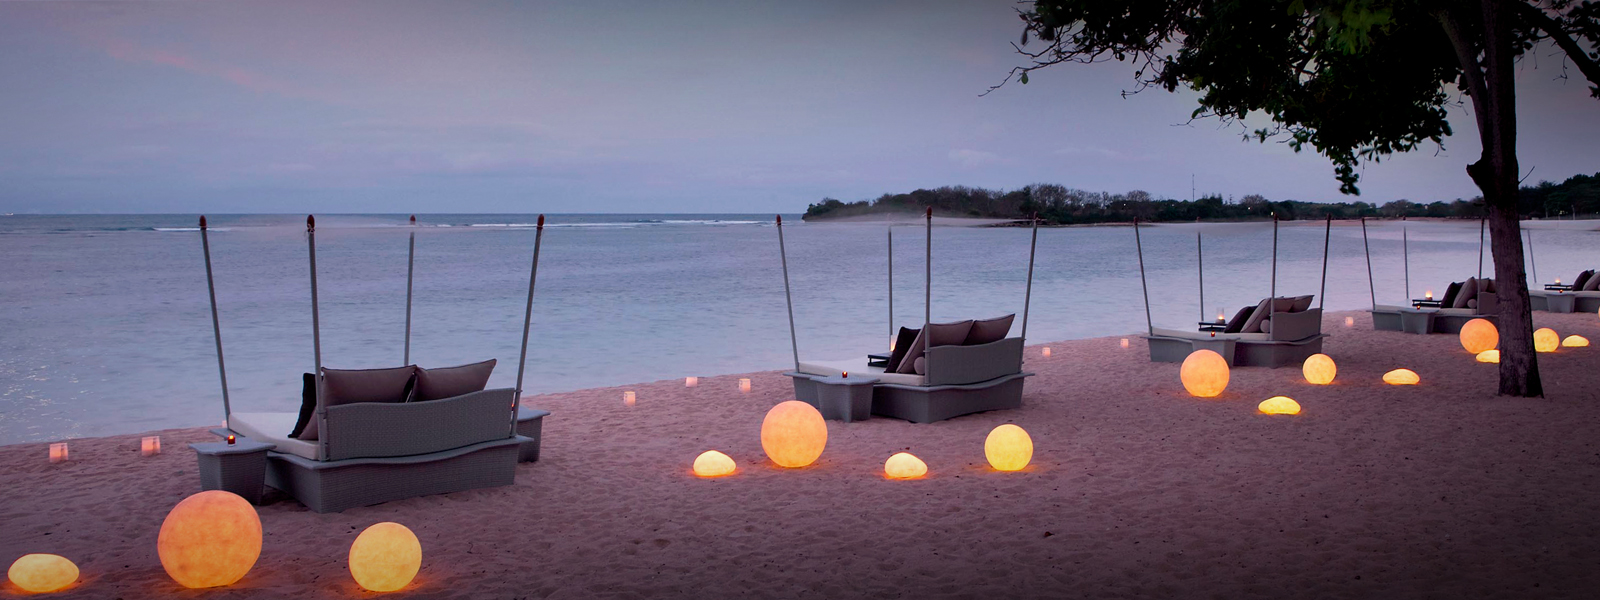 piment rouge bali lighting manufacturer lamps supplier for hospitality business slider hospitality lighting 3